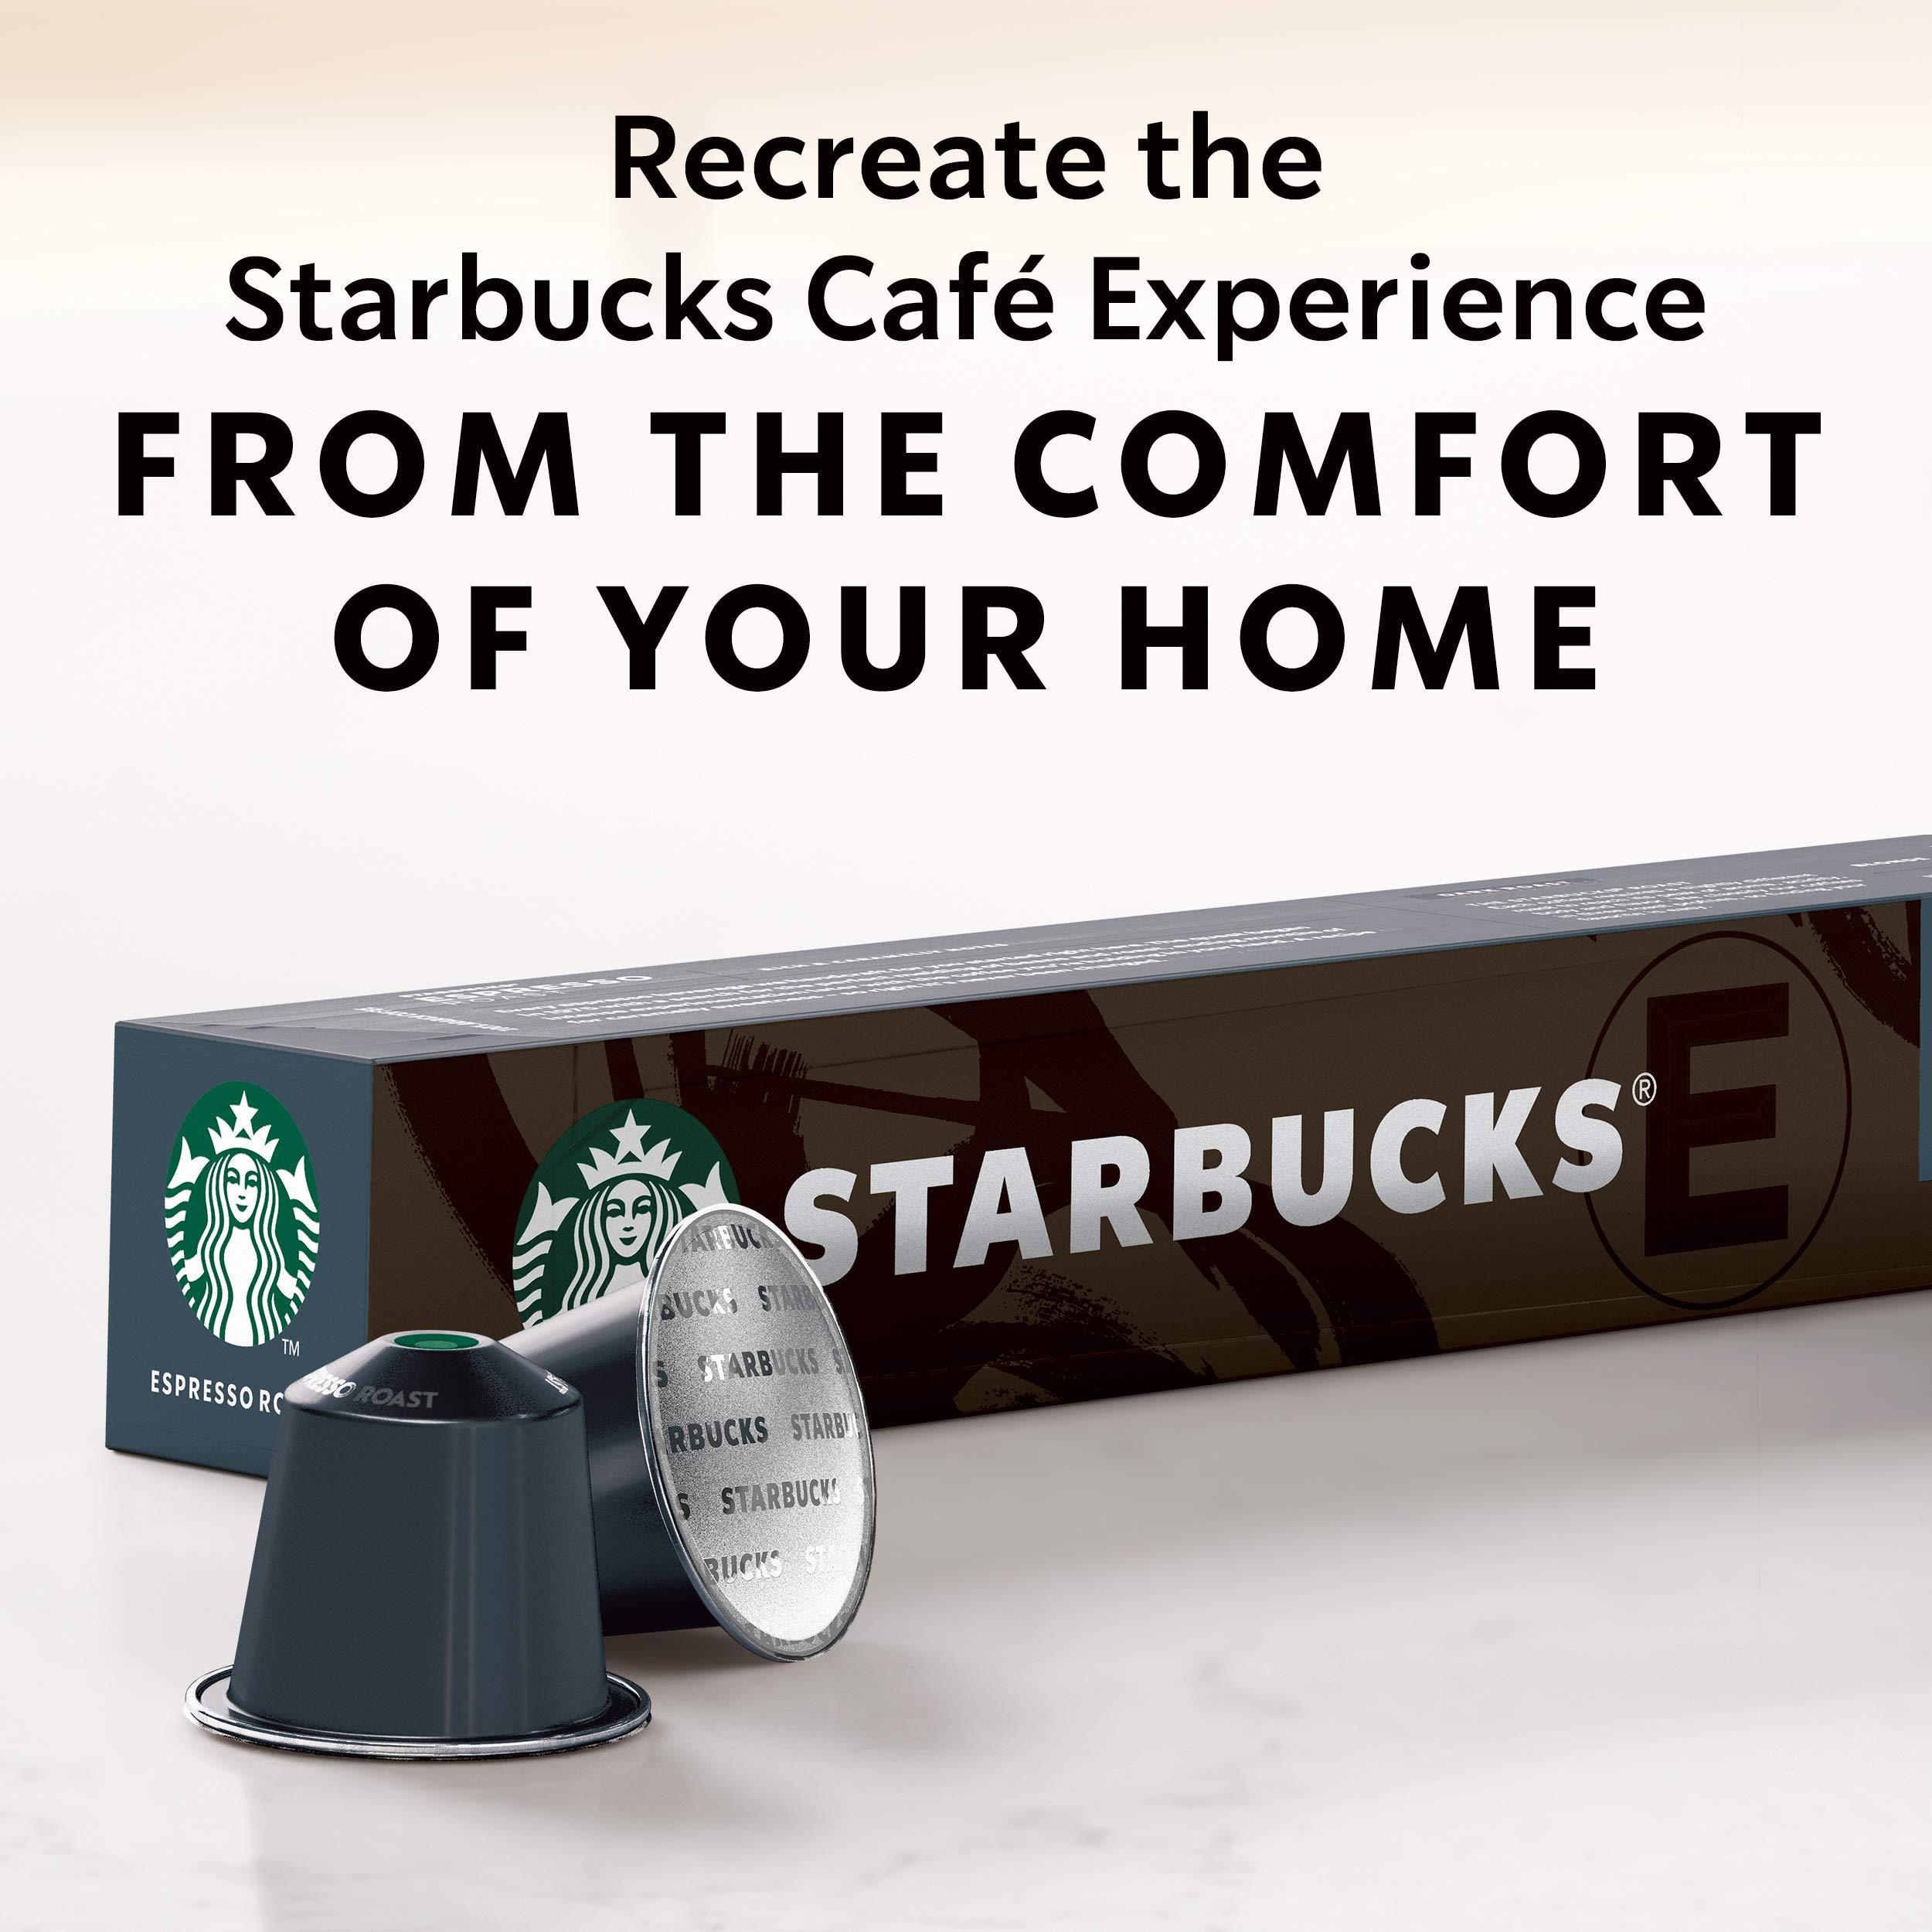 Starbucks by Nespresso, Espresso Dark Roast (50-count single serve capsules, compatible with Nespresso Original Line System) by Starbucks for Nespresso (Image #6)